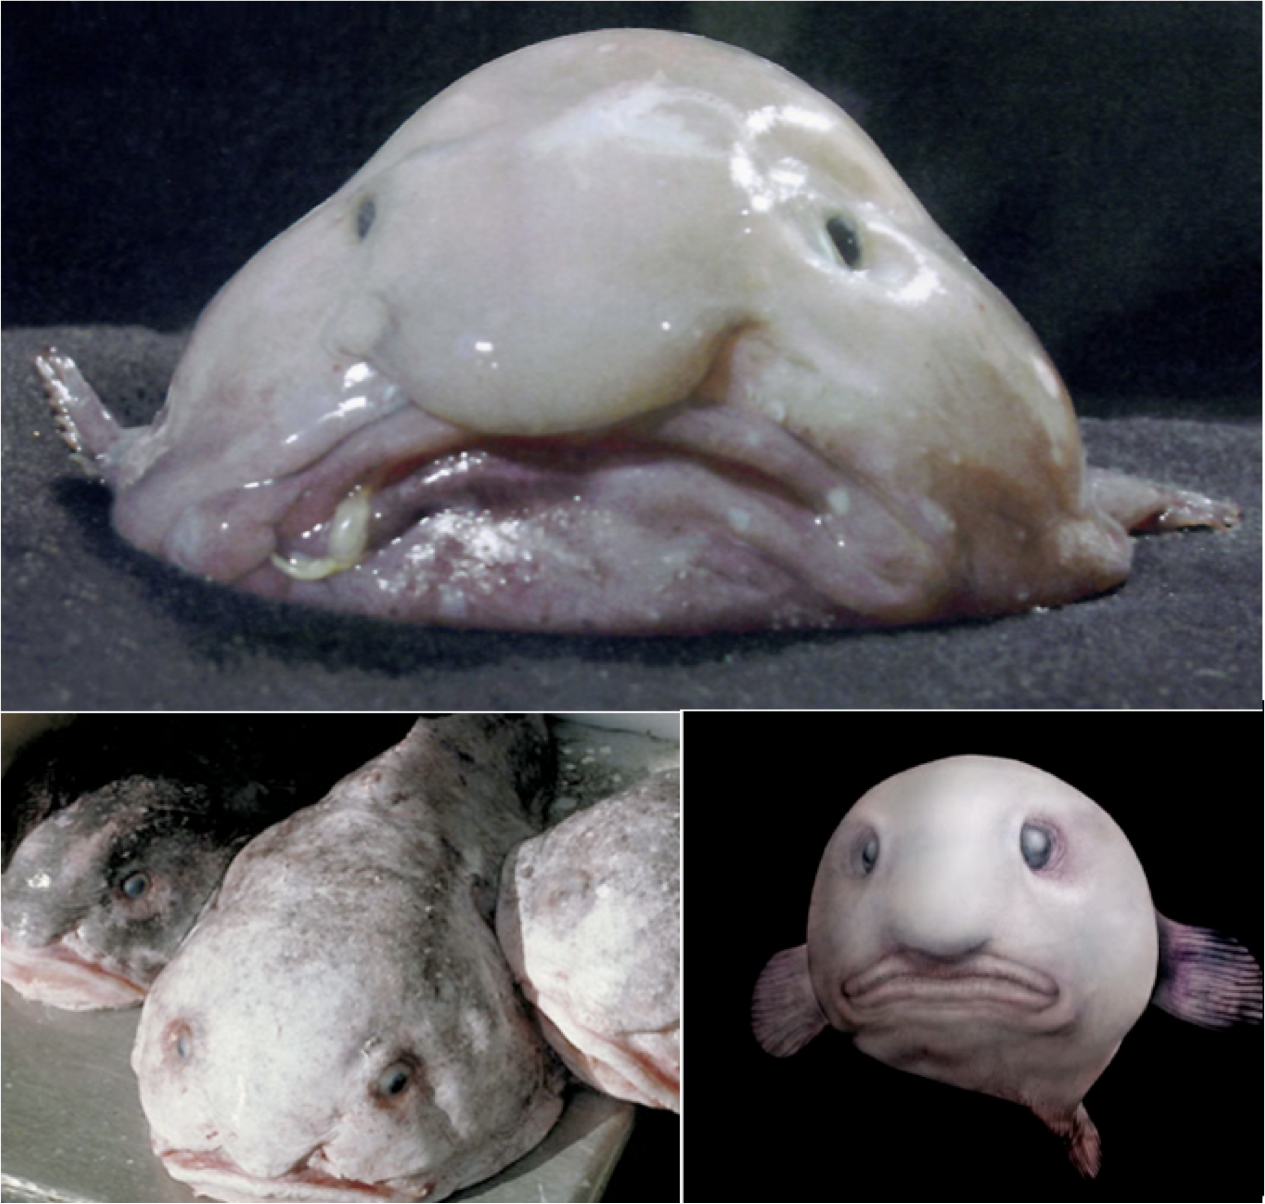 ugly face fish - HD1265×1204